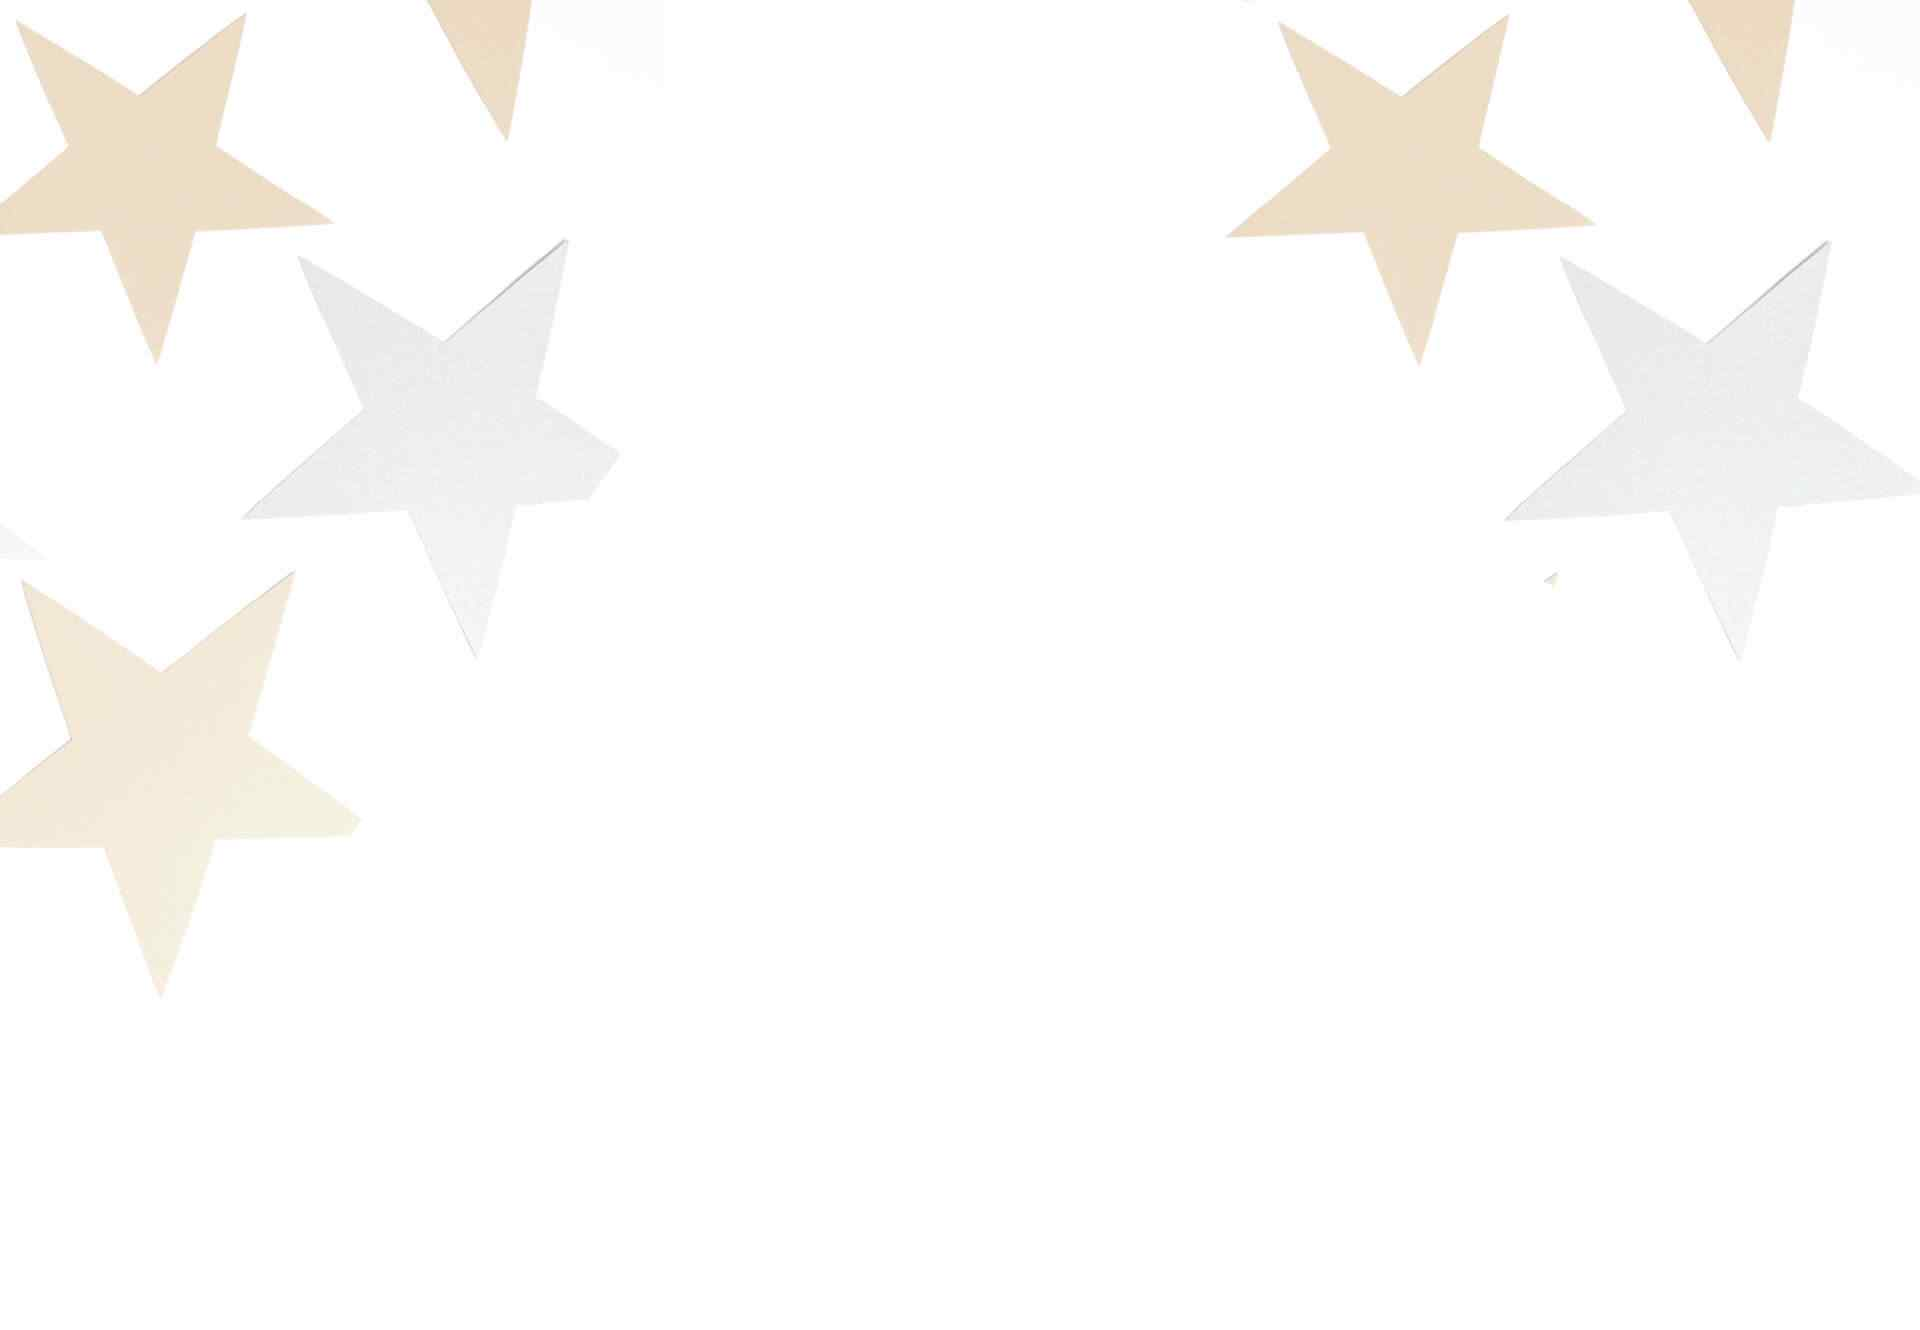 https://hilltop.sc.ke/wp-content/uploads/2019/05/background_stars.jpg